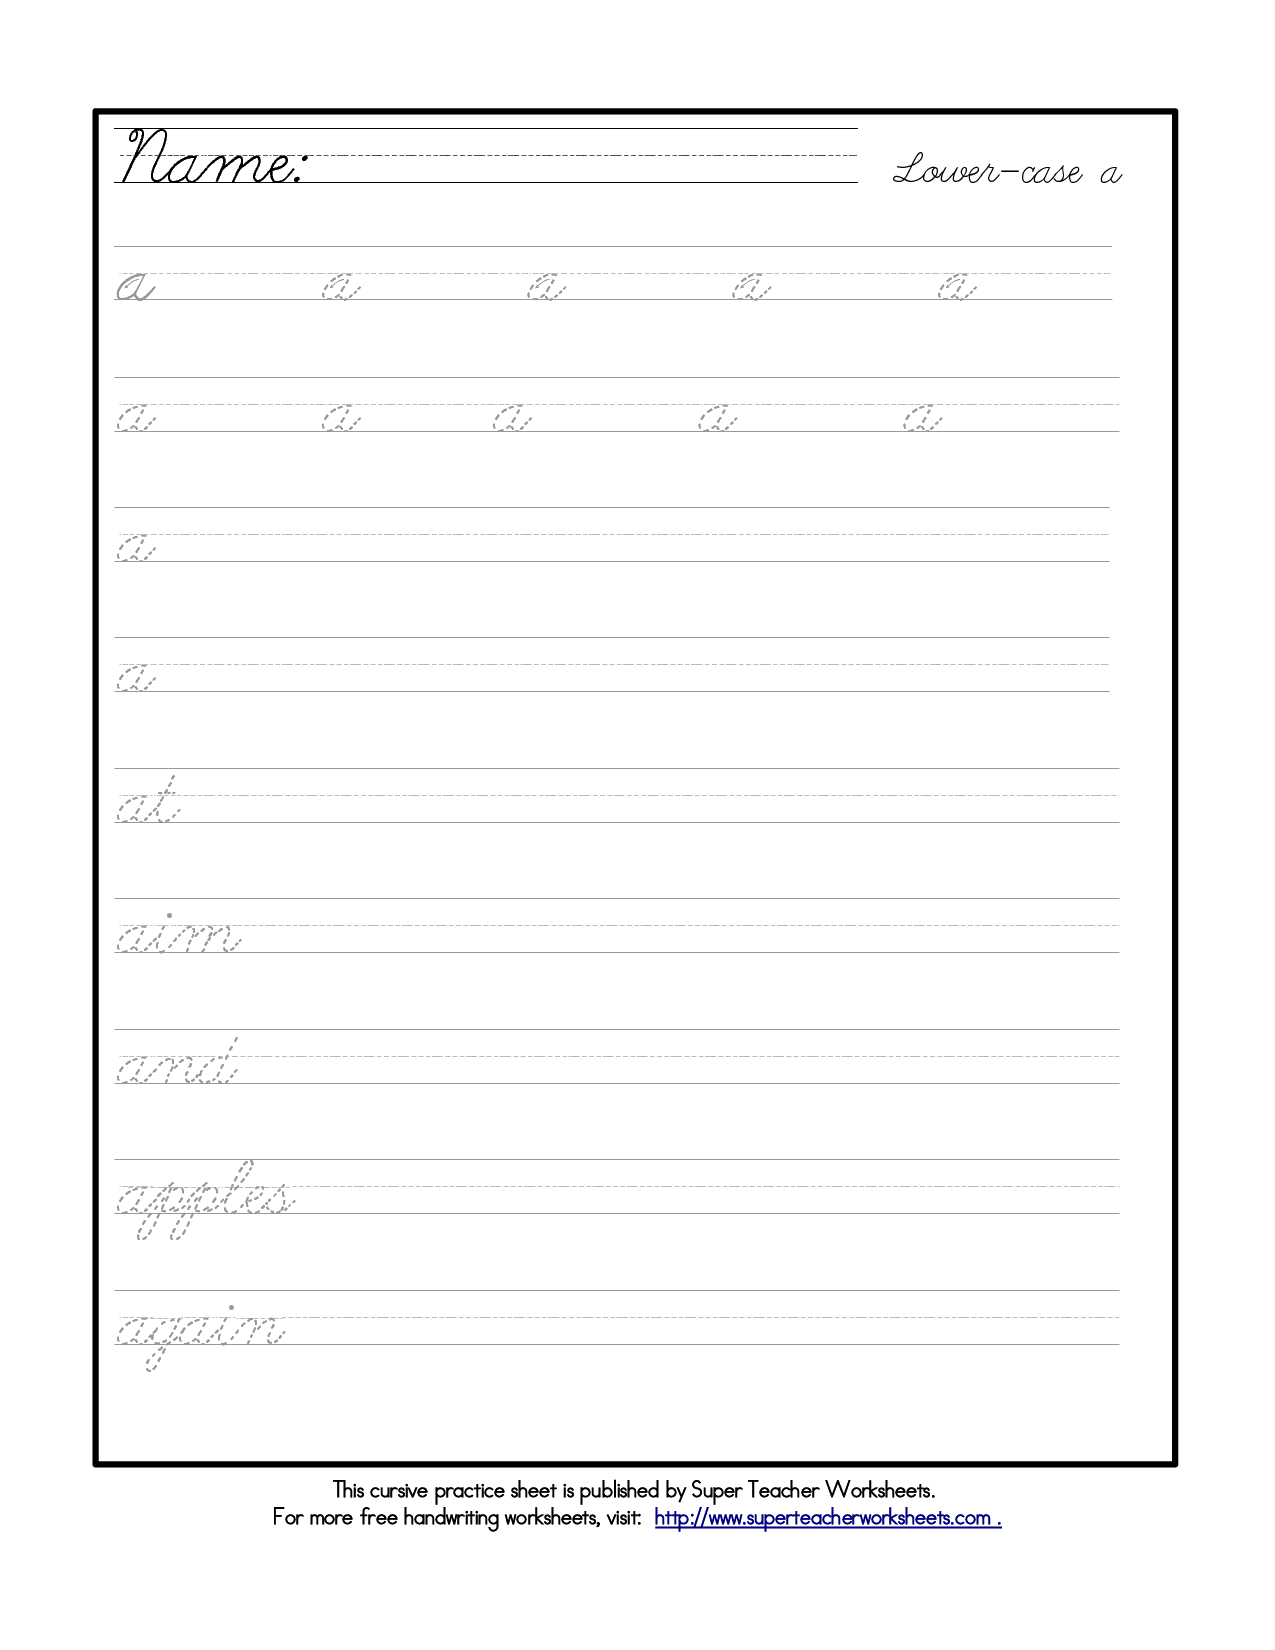 Worksheet For Teaching Cursive Handwriting